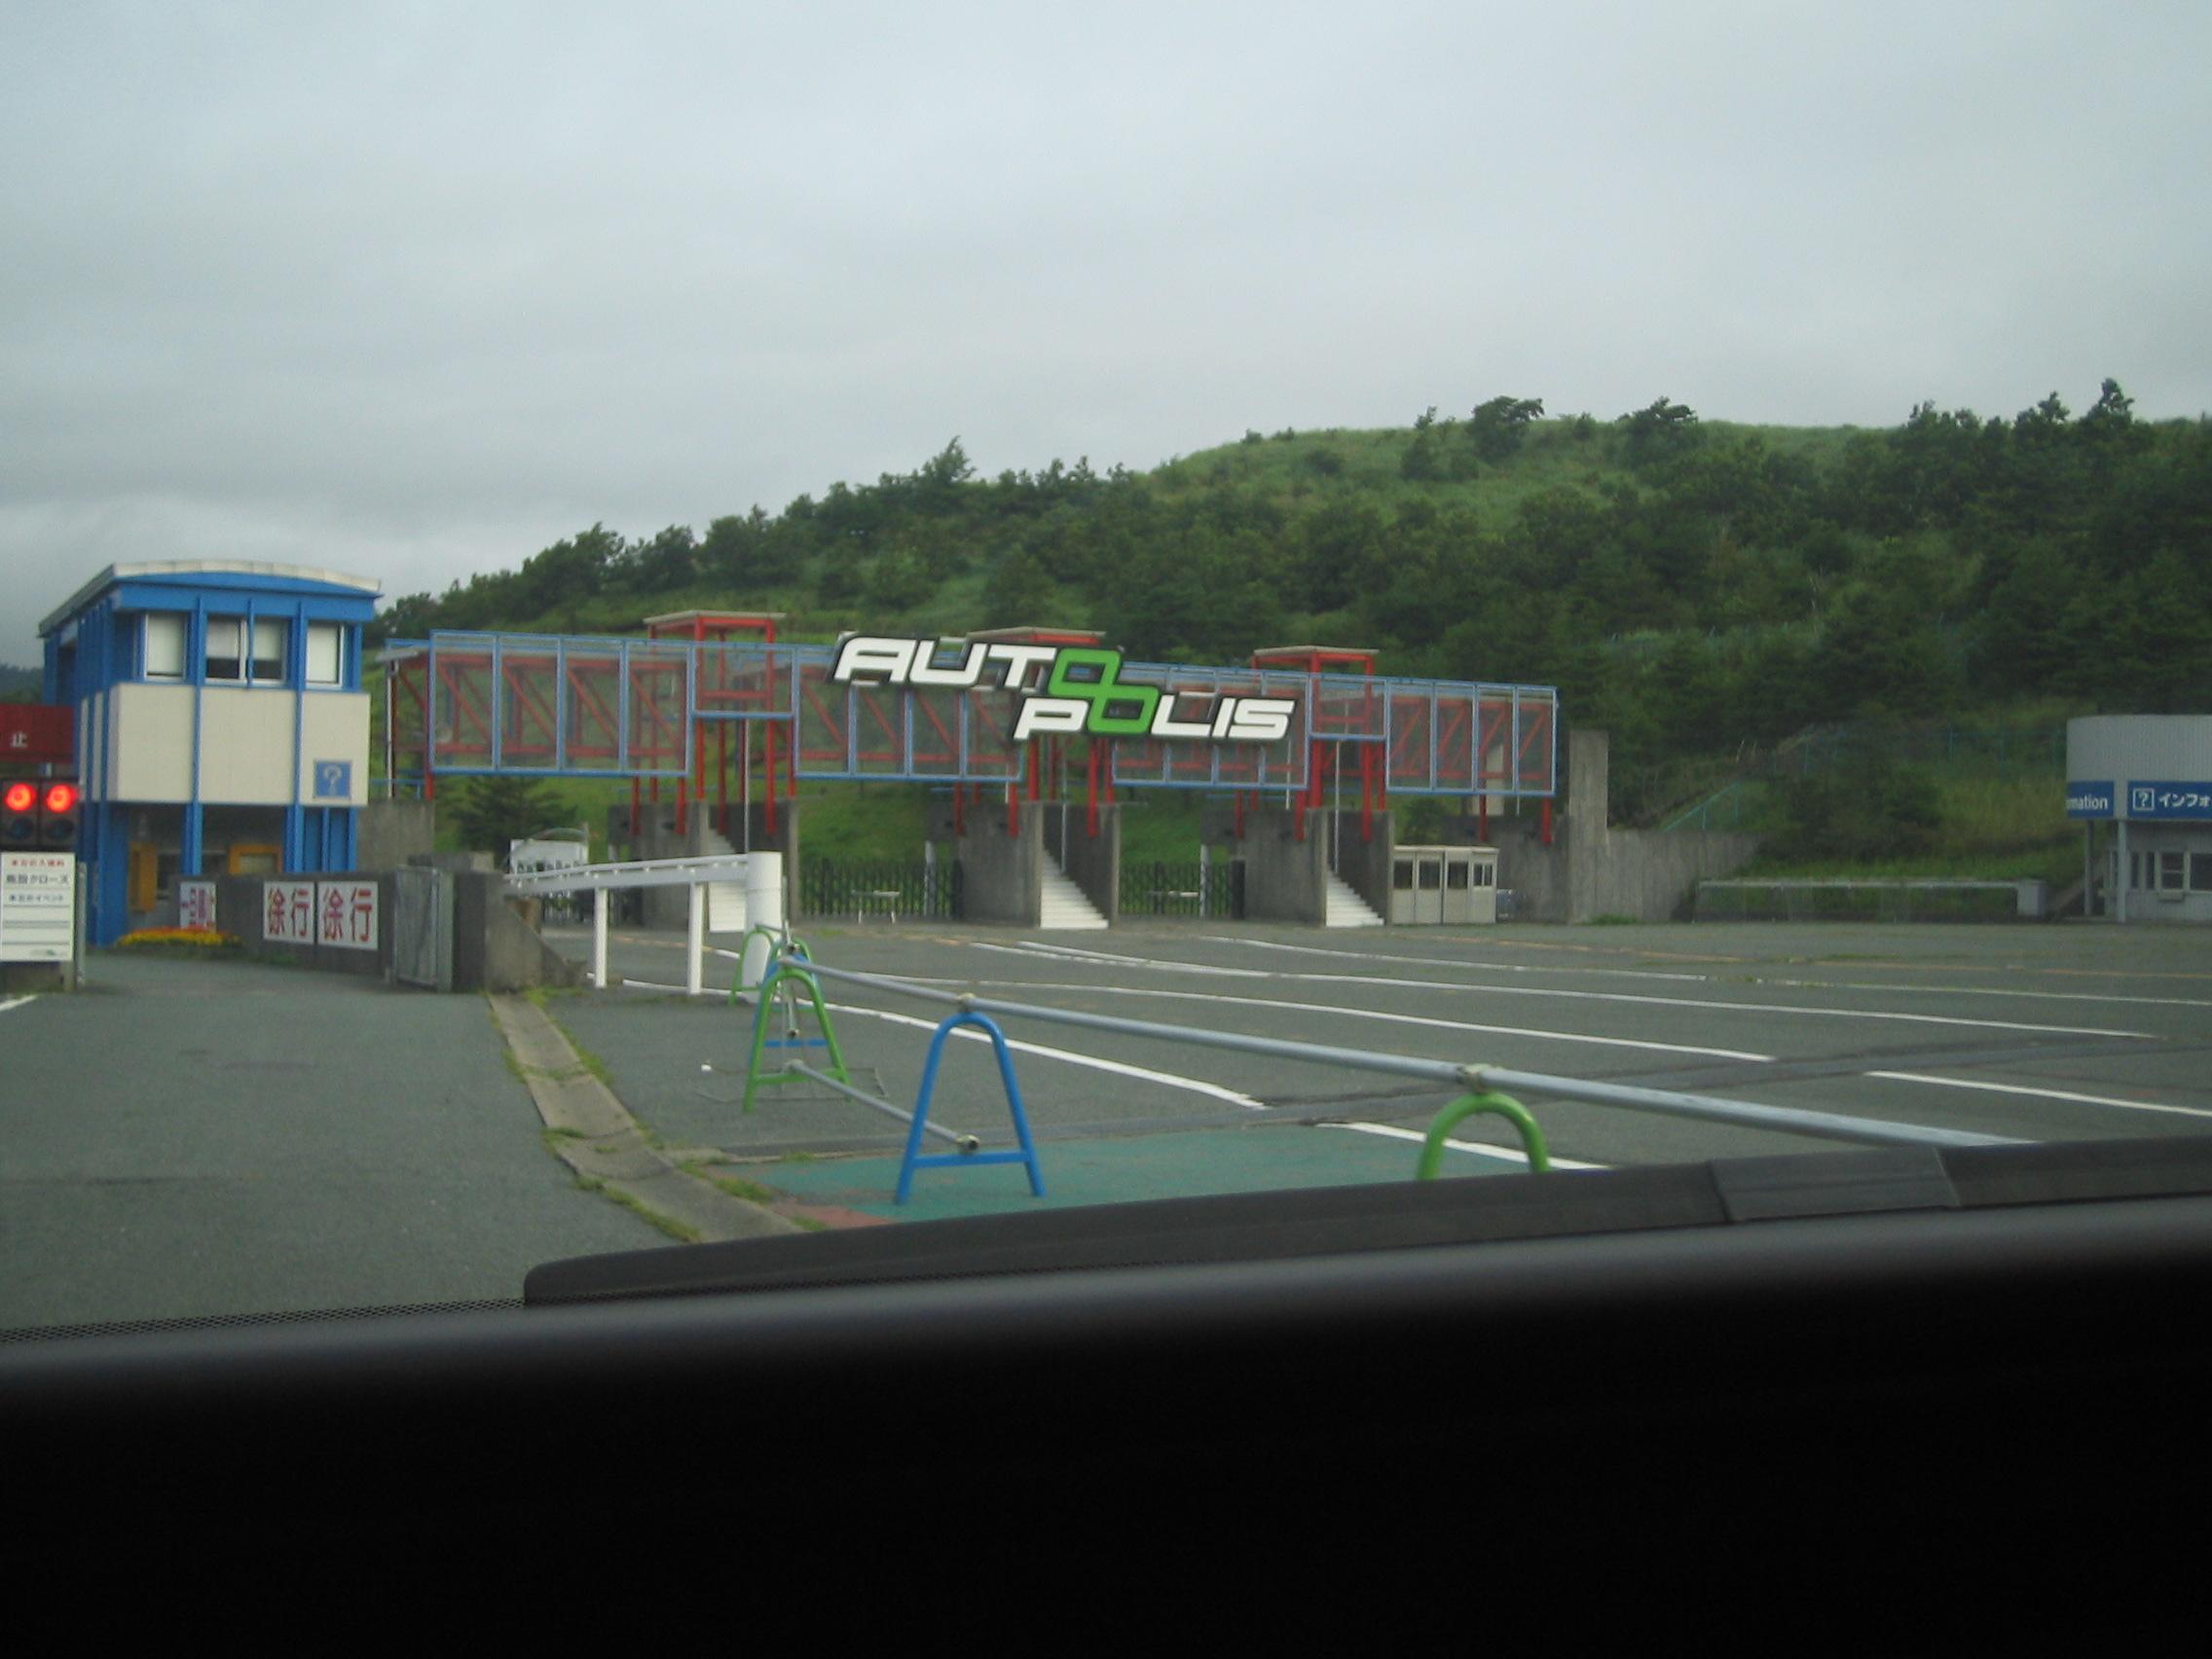 Autopolis_Entry_Gate_2007.jpg